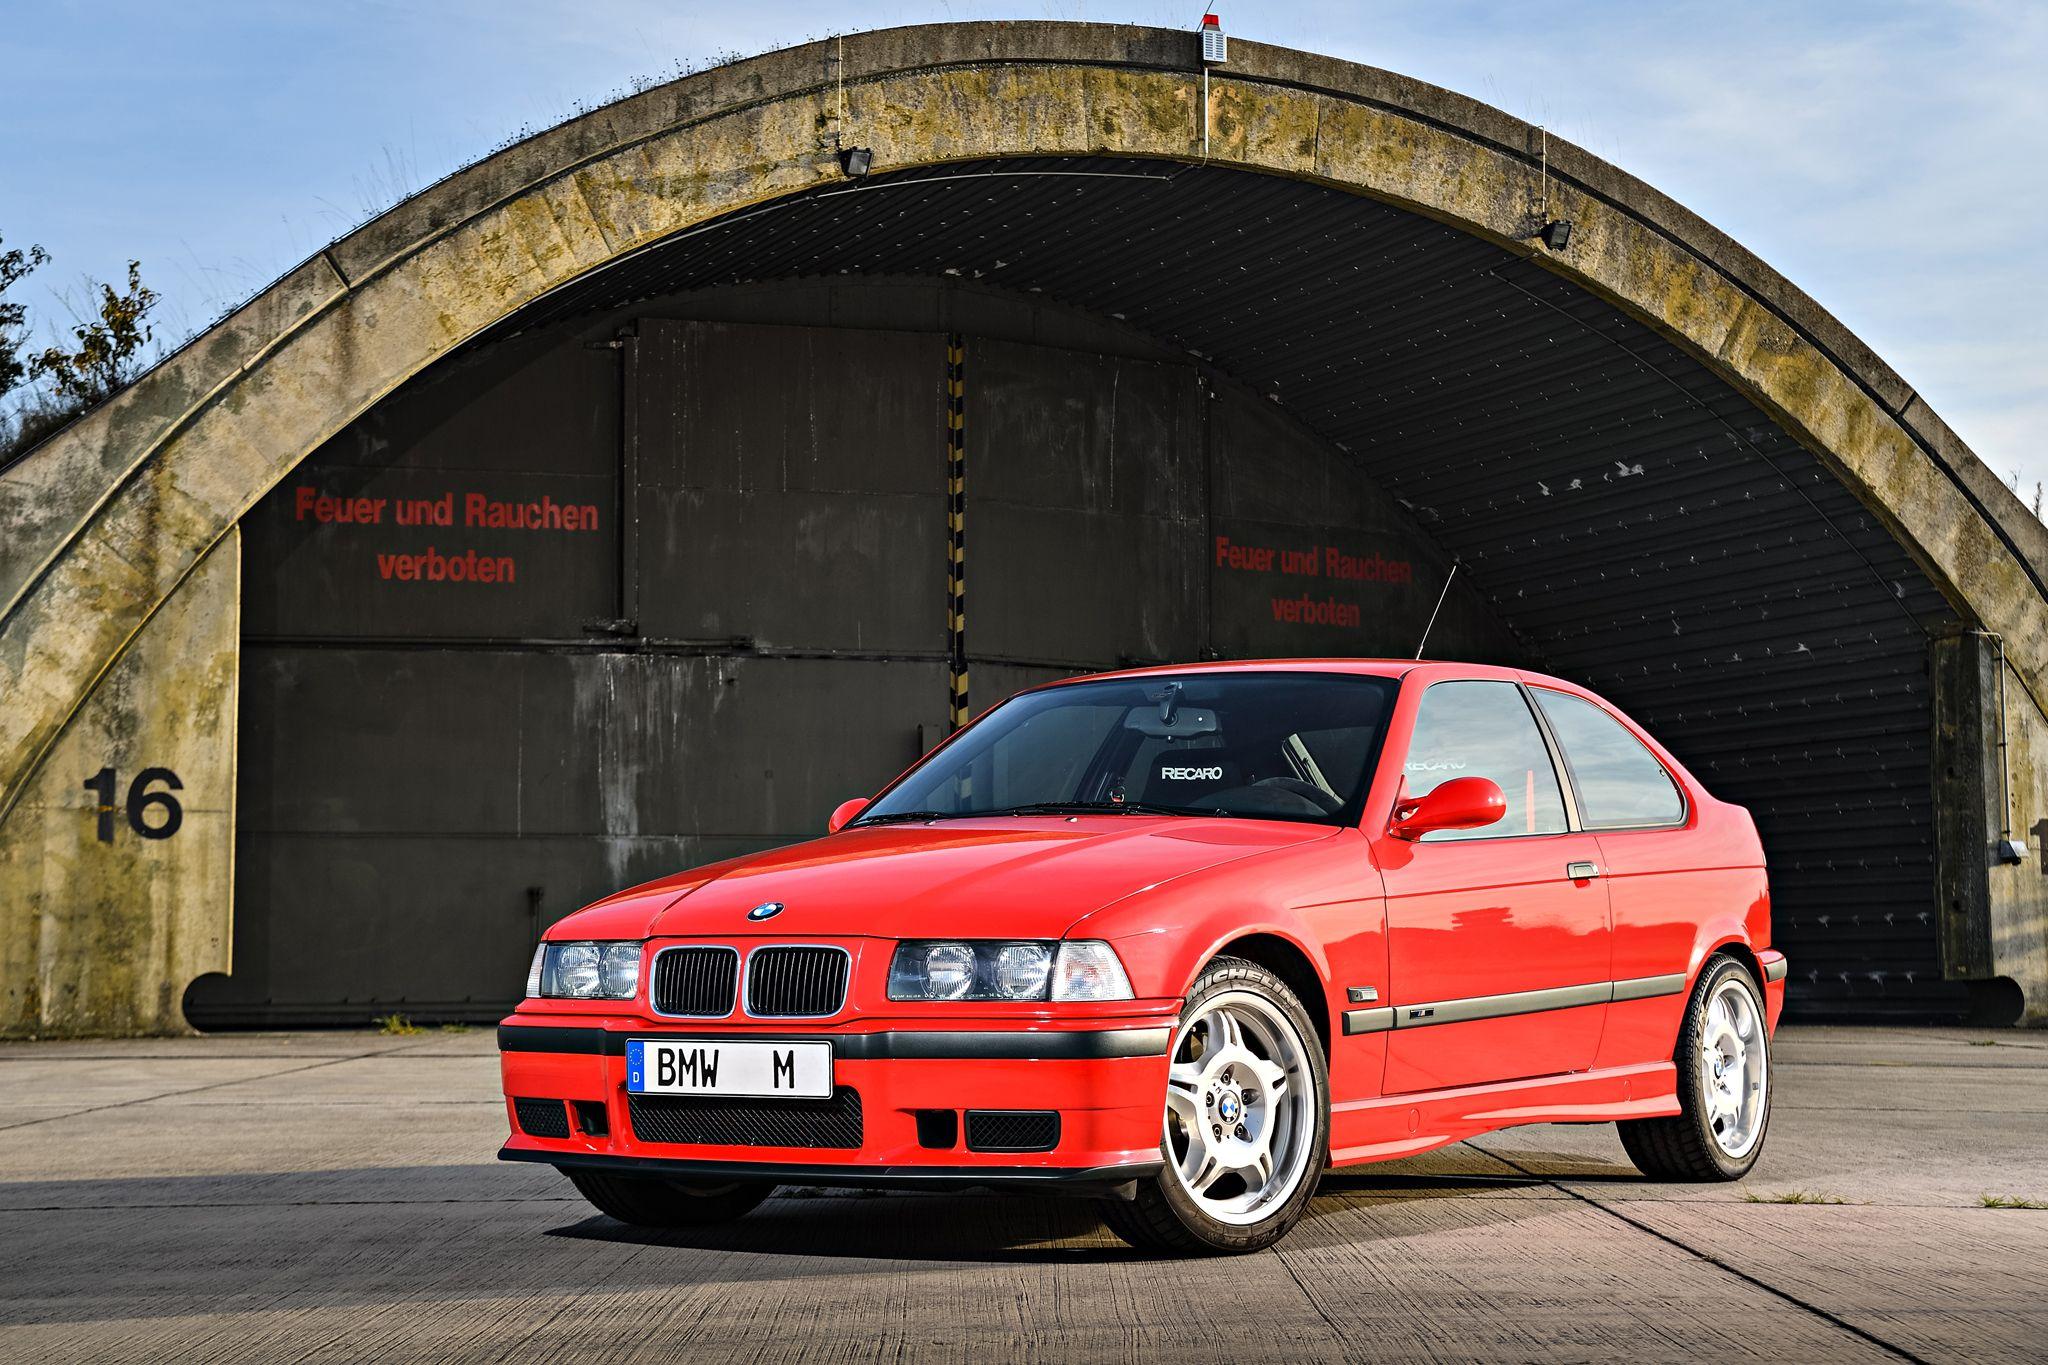 BMW E36 M3 pact MPower Badass Burn Provocative Eyes y